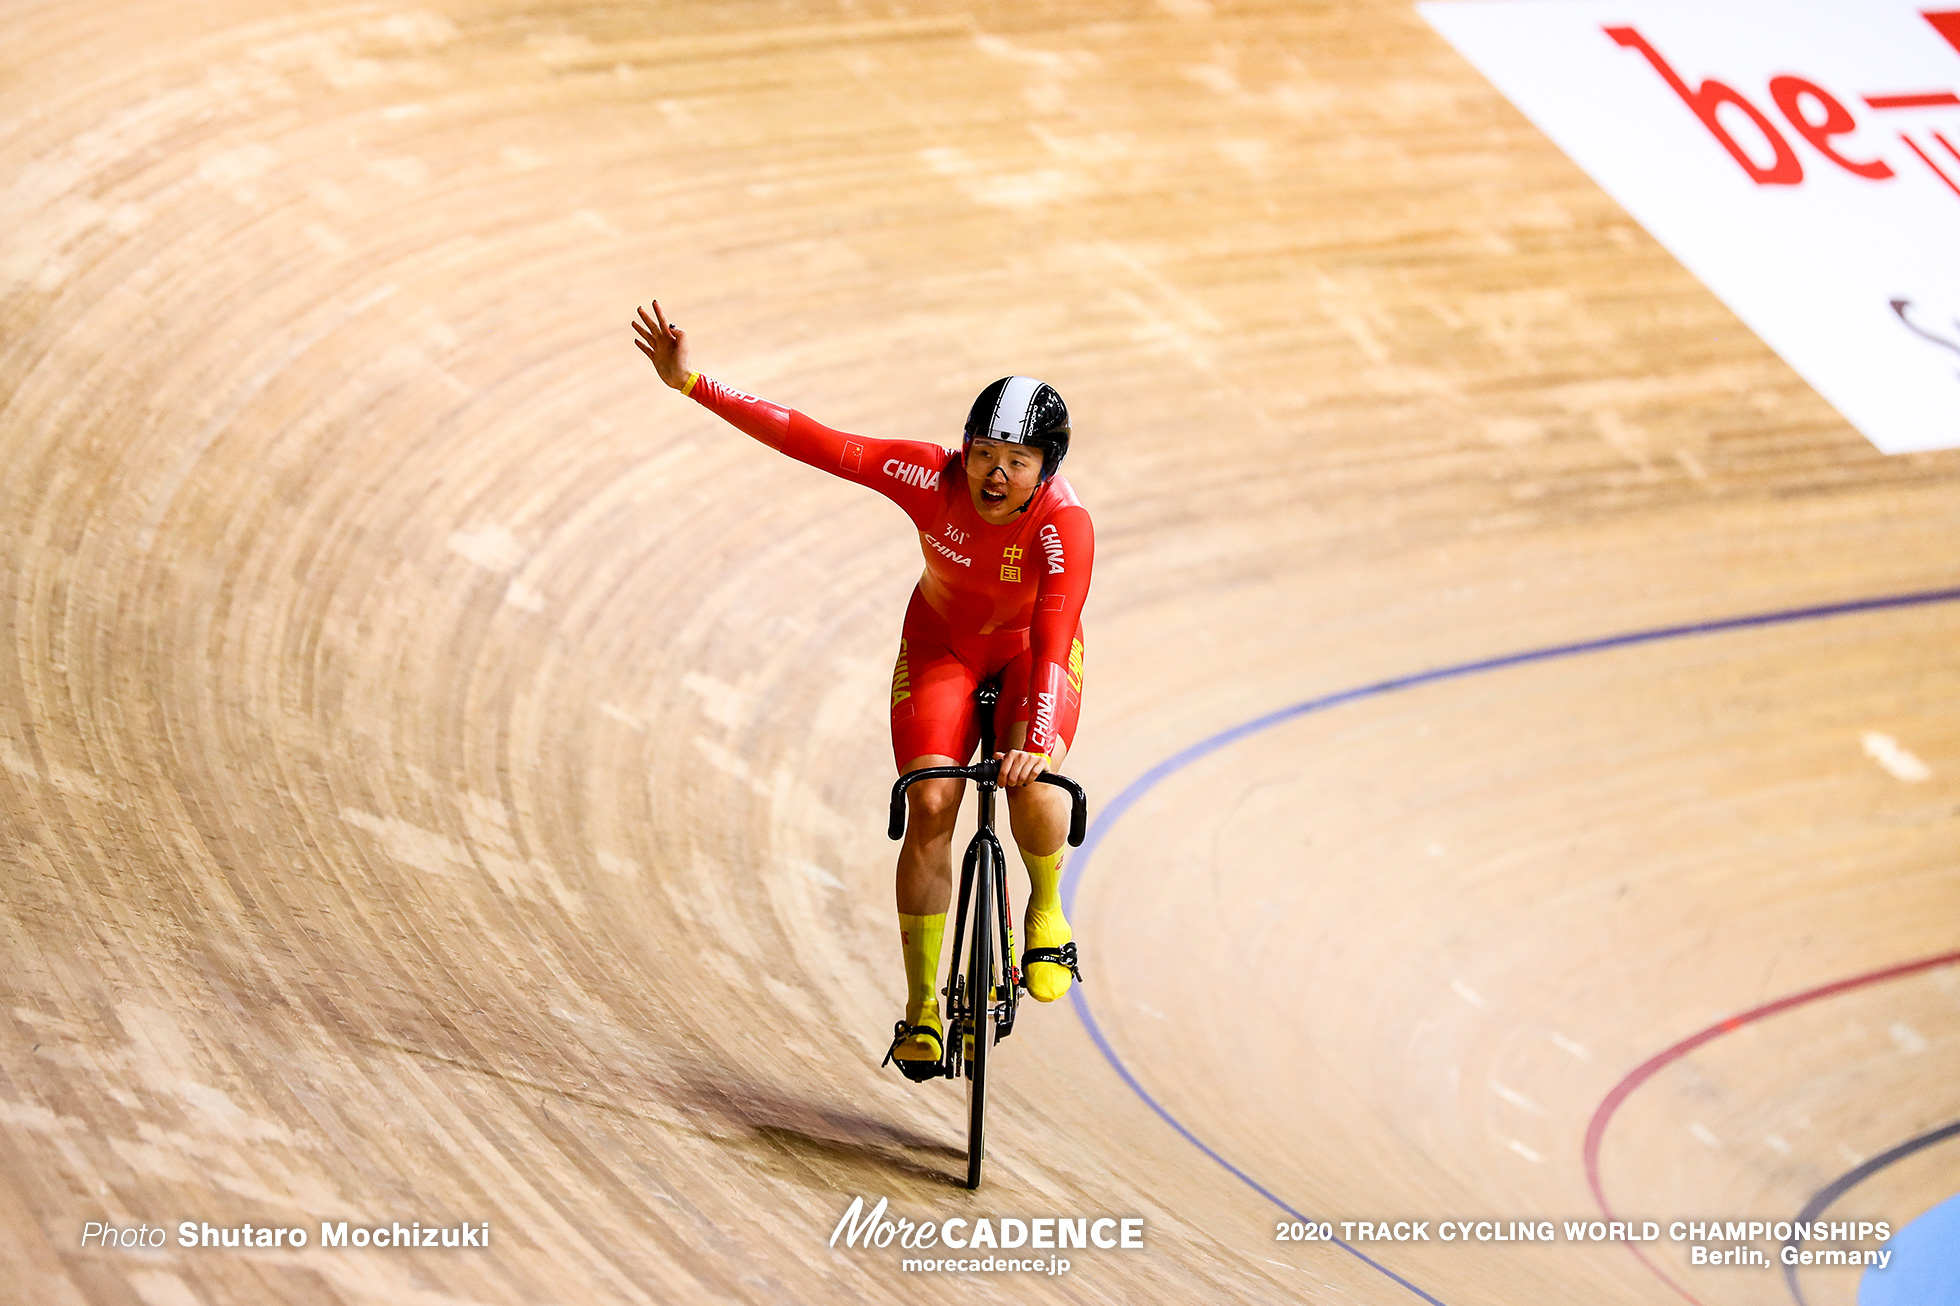 Women's Team Sprint / 2020 Track Cycling World Championships, Chen Feifei チェン・フェイフェイ